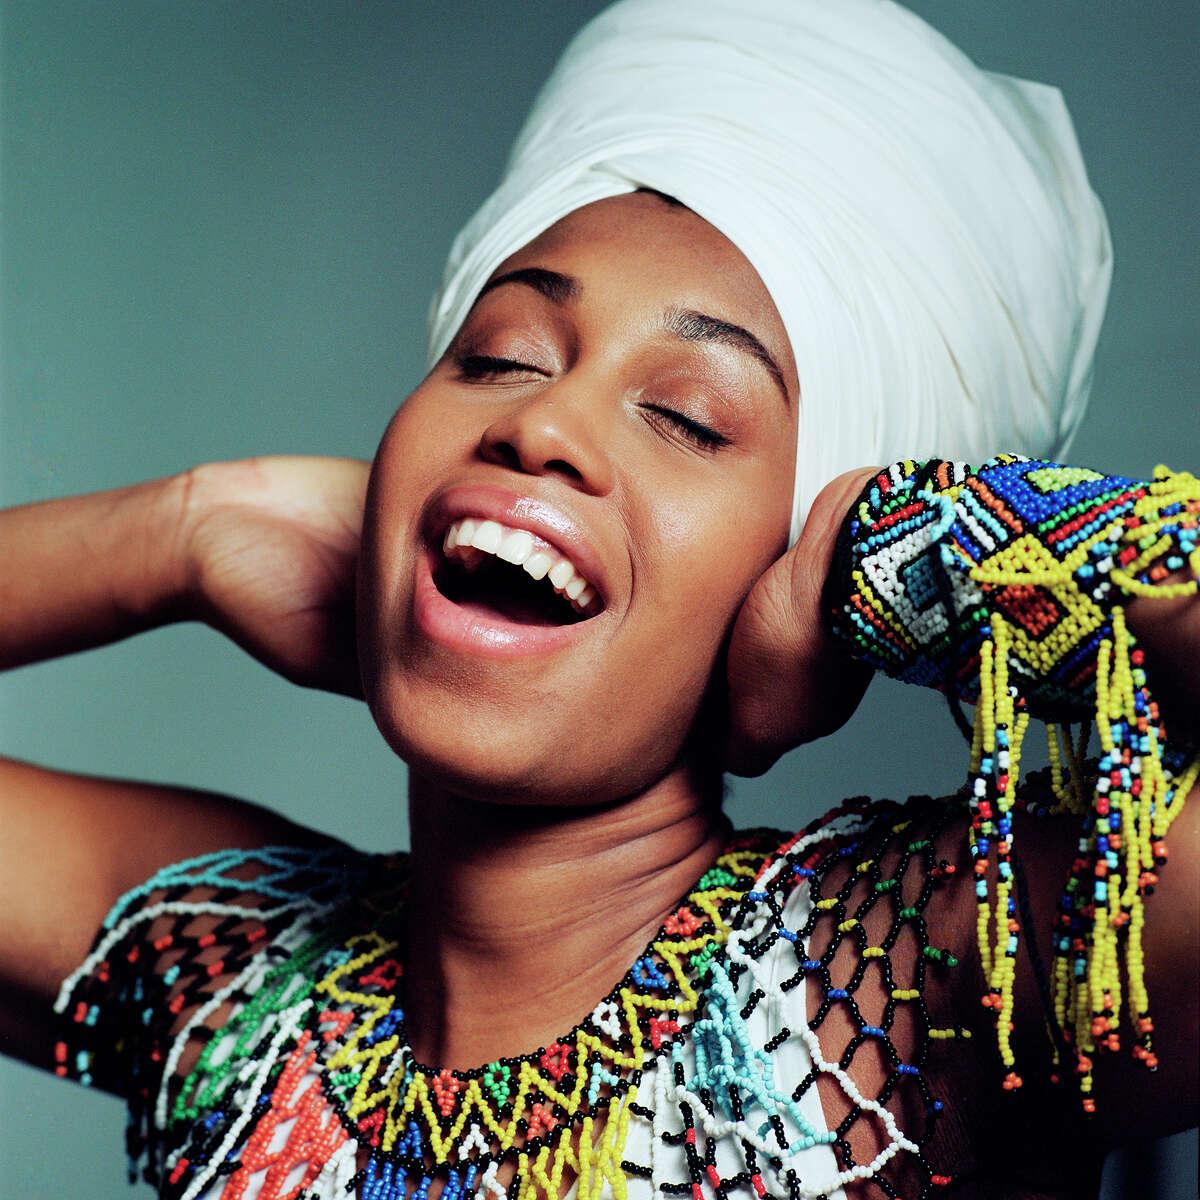 Singer Jazzmeia Horn